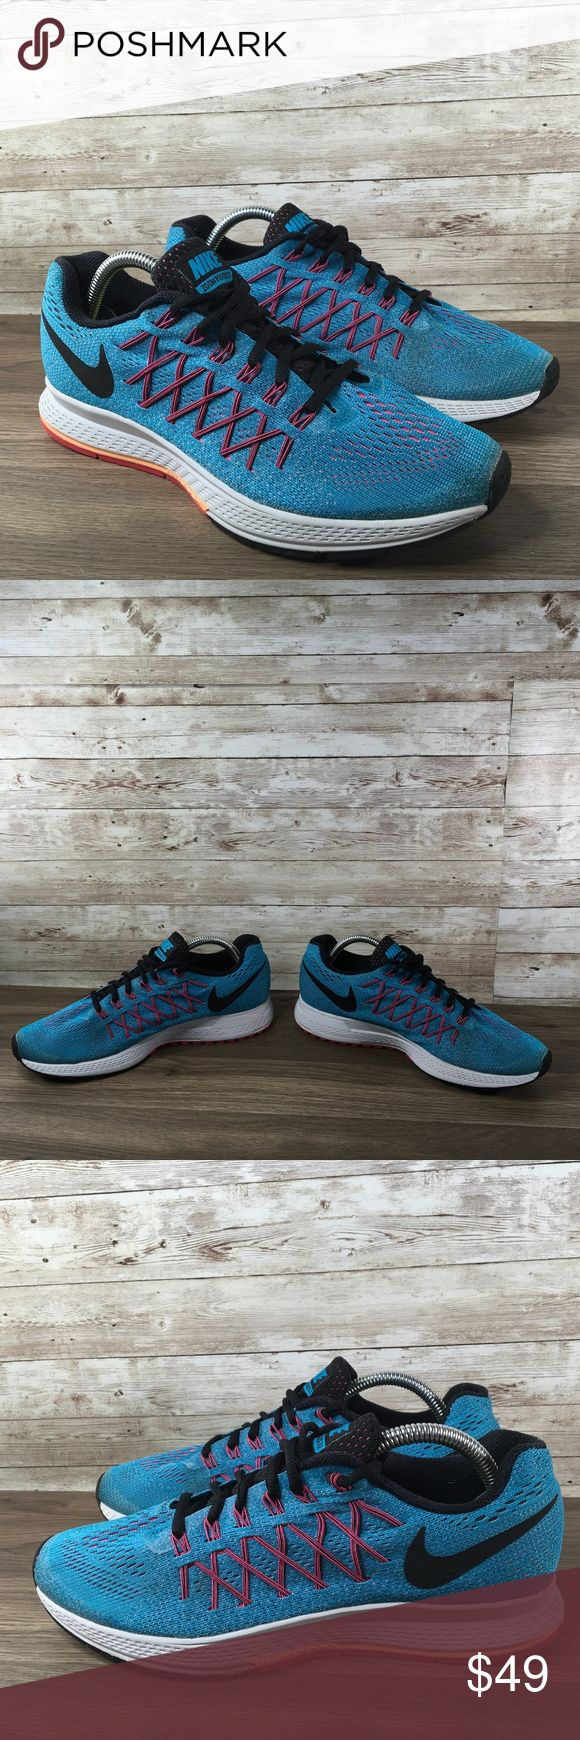 Nike Zoom Pegasus 32 Running Shoes Gently used. Smoke free. No box. We always ca…